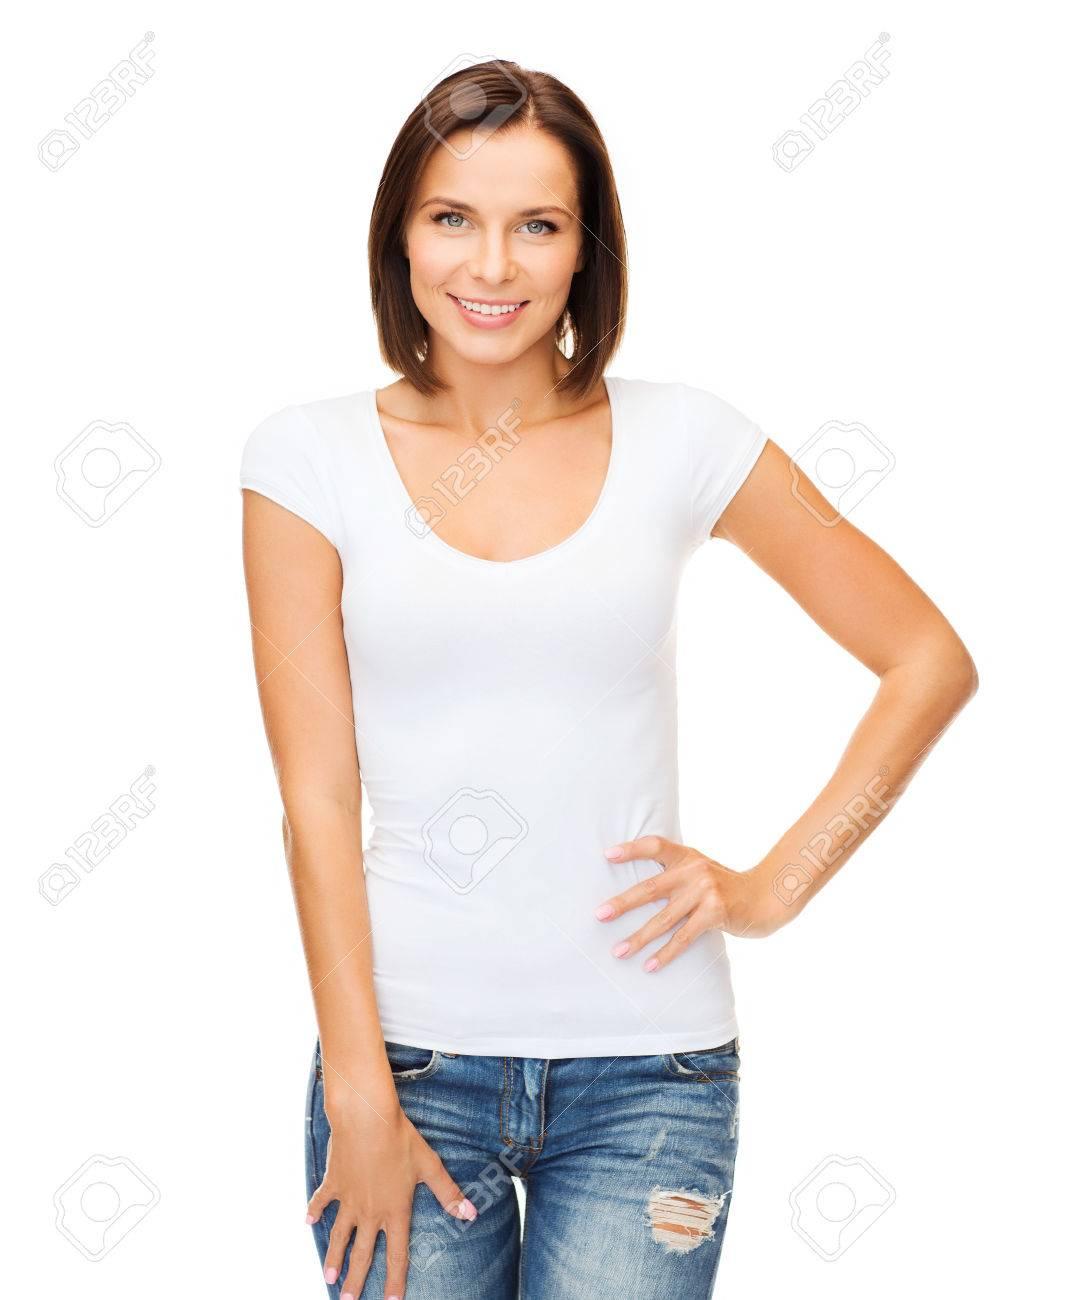 Shirt design female - Stock Photo T Shirt Design Concept Smiling Woman In Blank White T Shirt